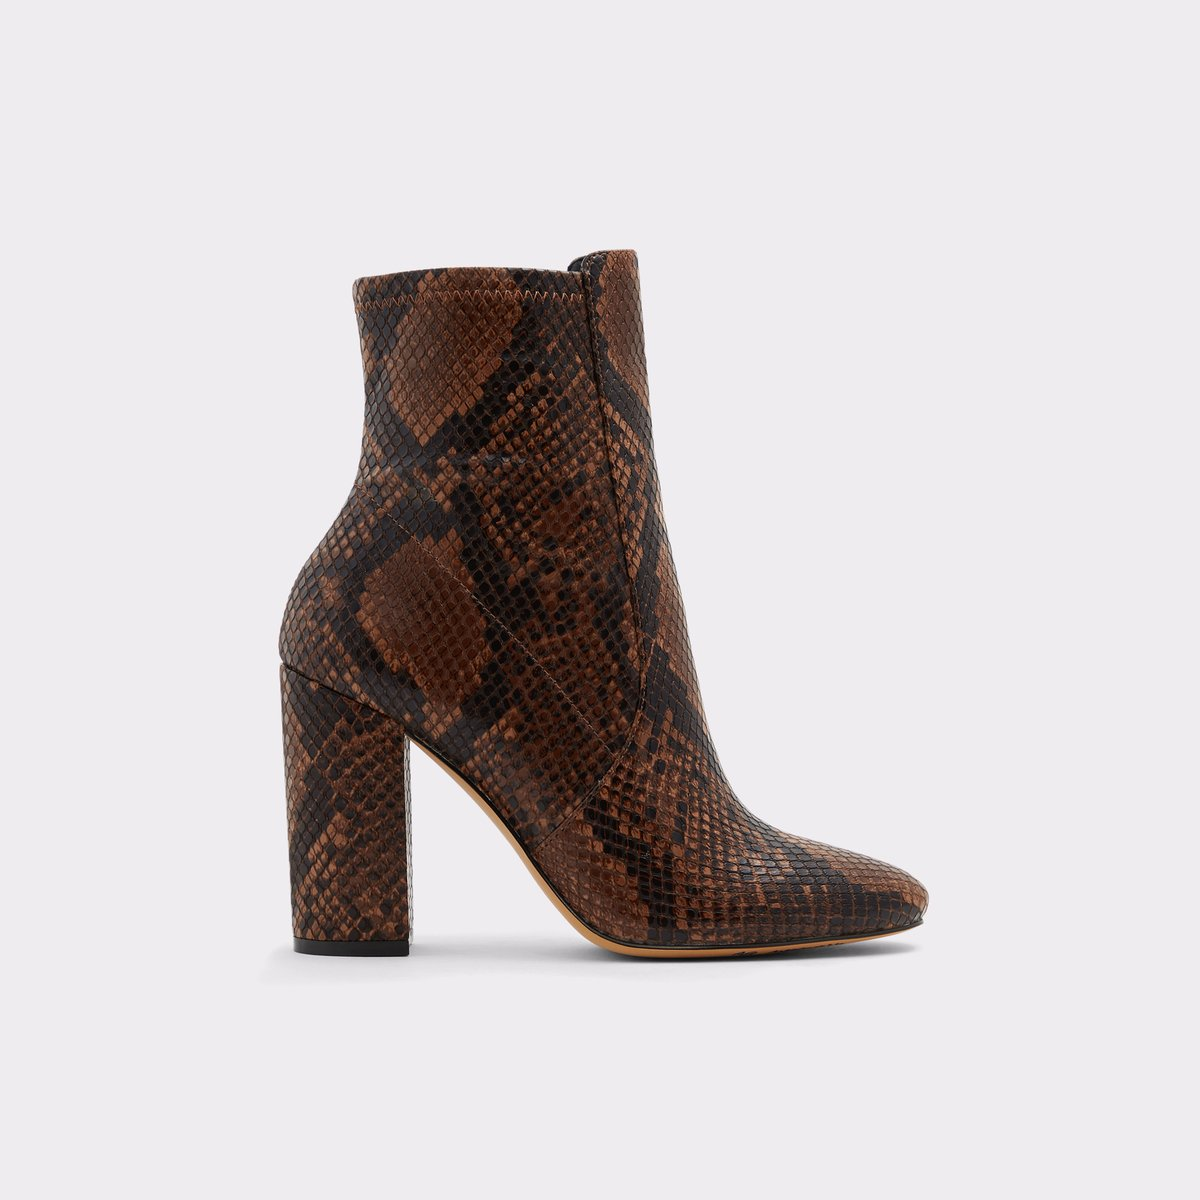 cheap for sale presenting 100% quality Aurella Brown Women's Ankle boots | Aldoshoes.com US